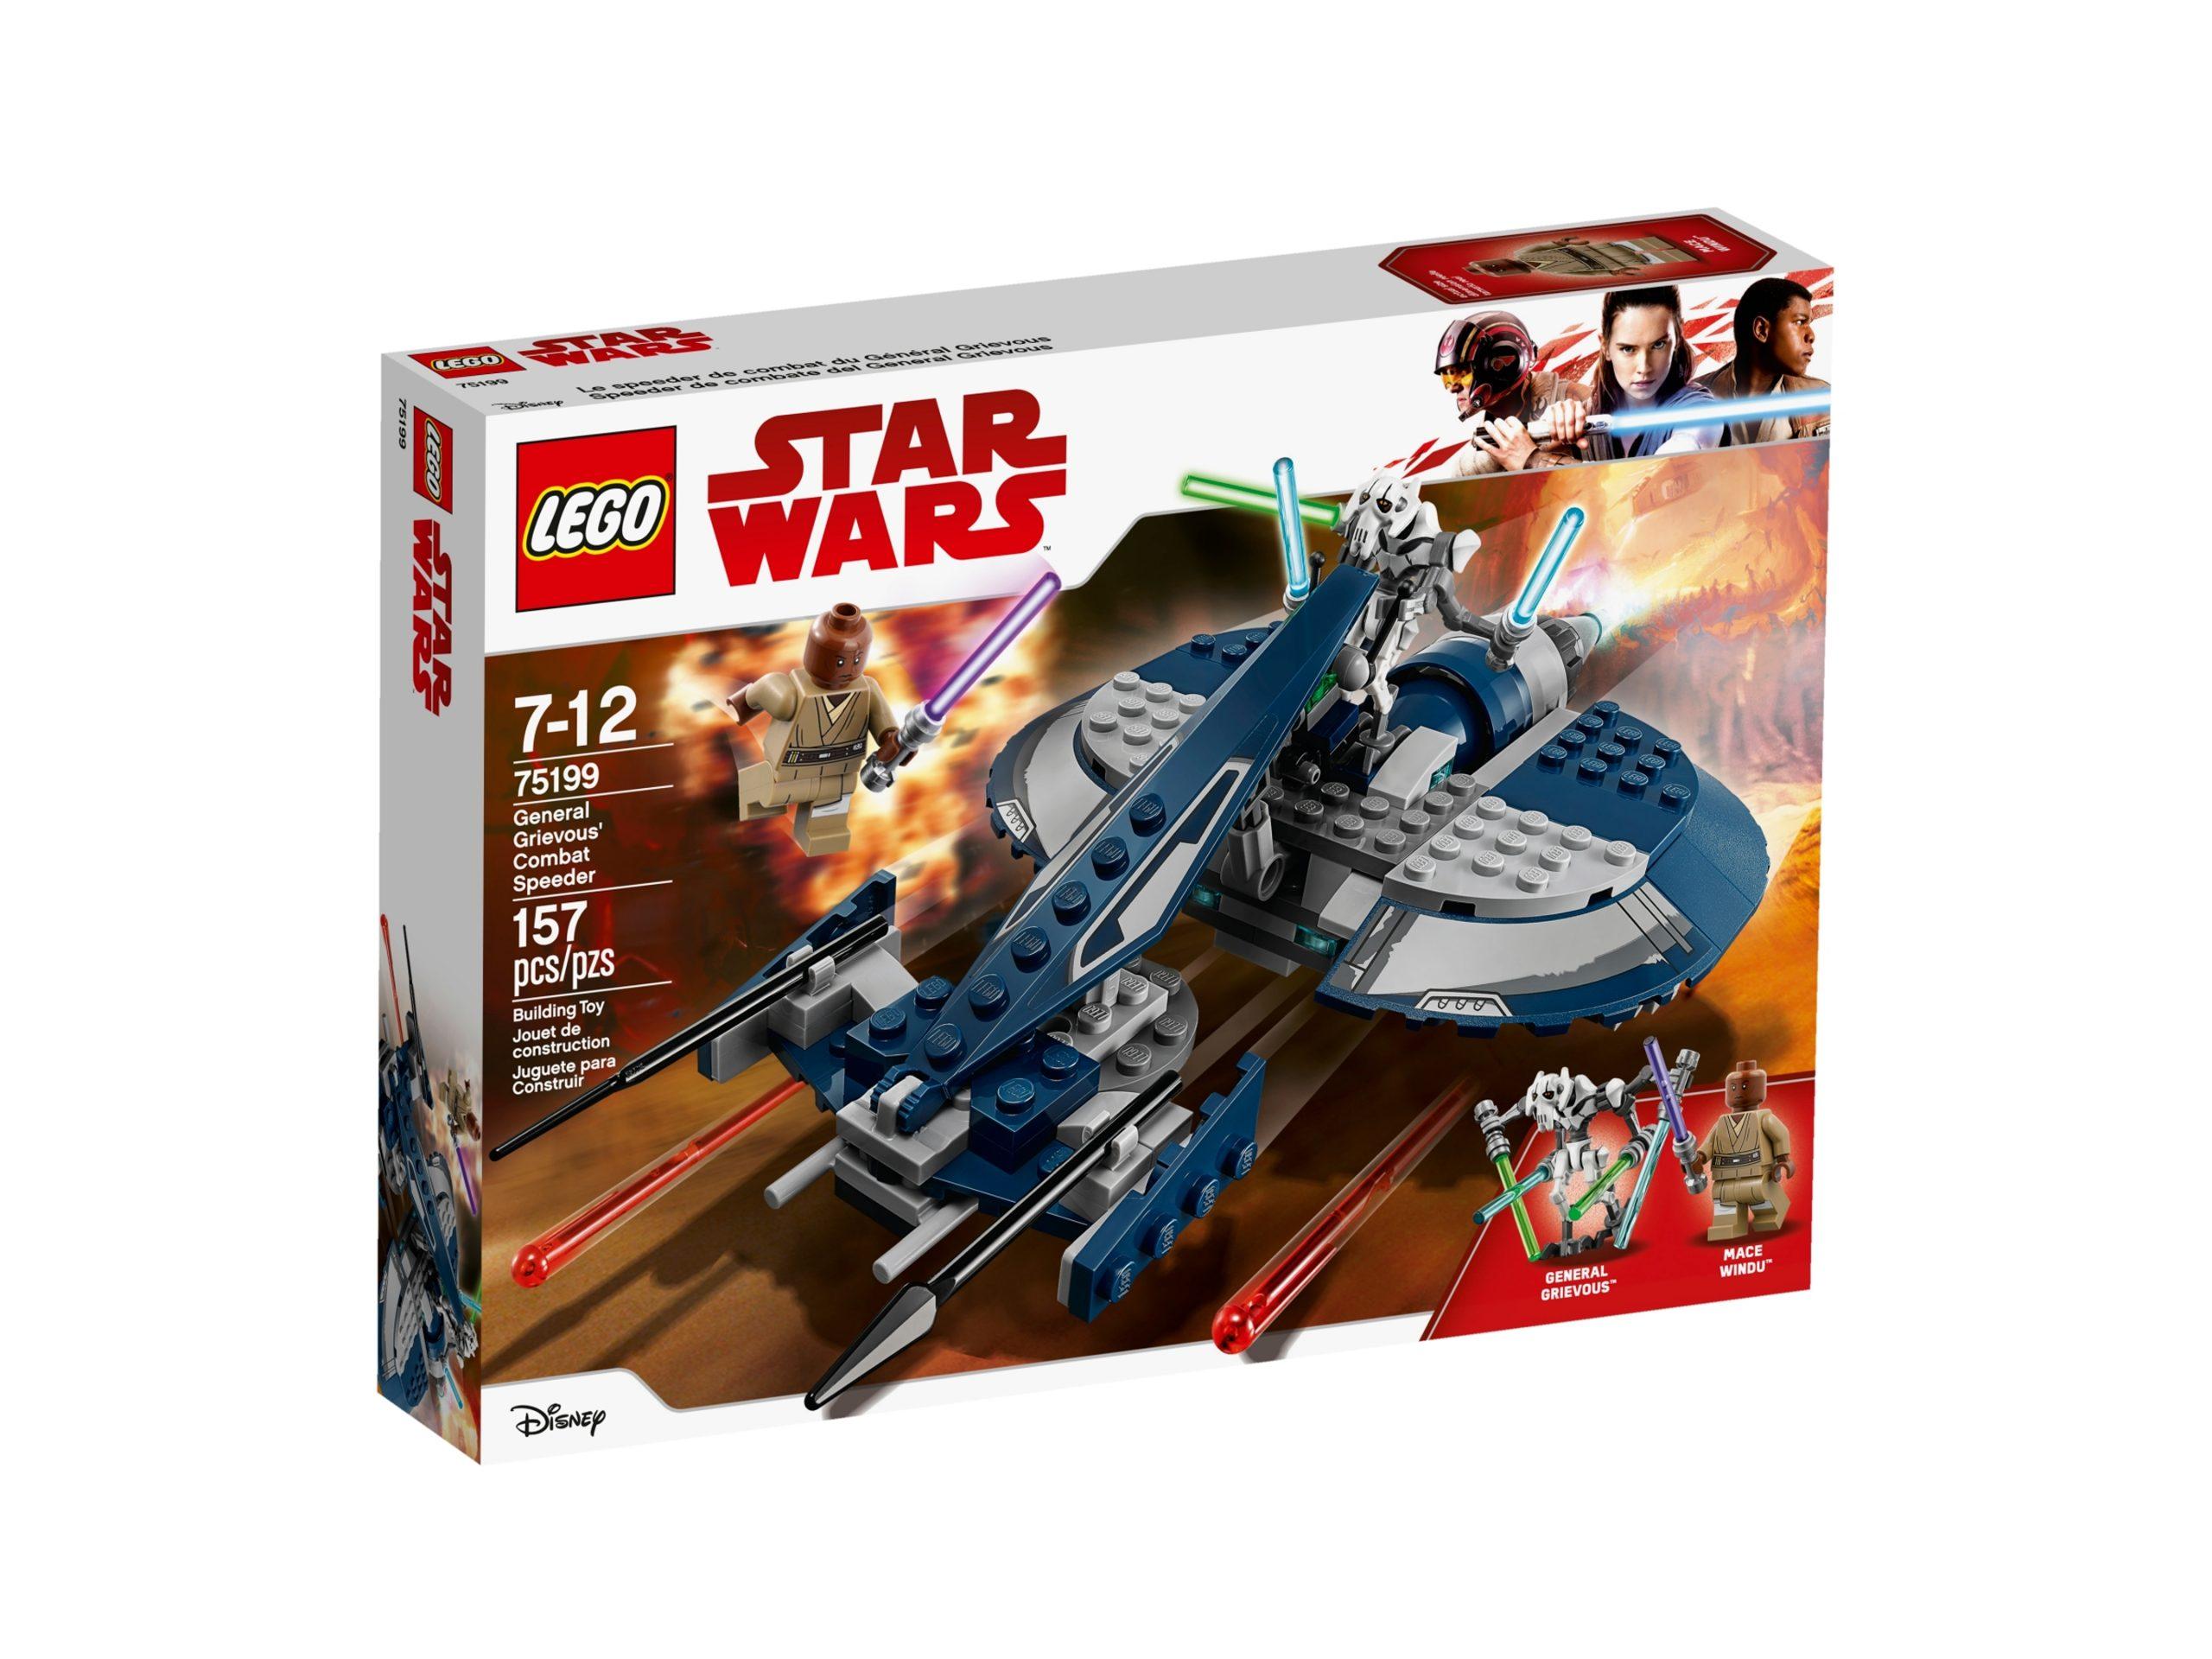 lego 75199 general grievous combat speeder scaled